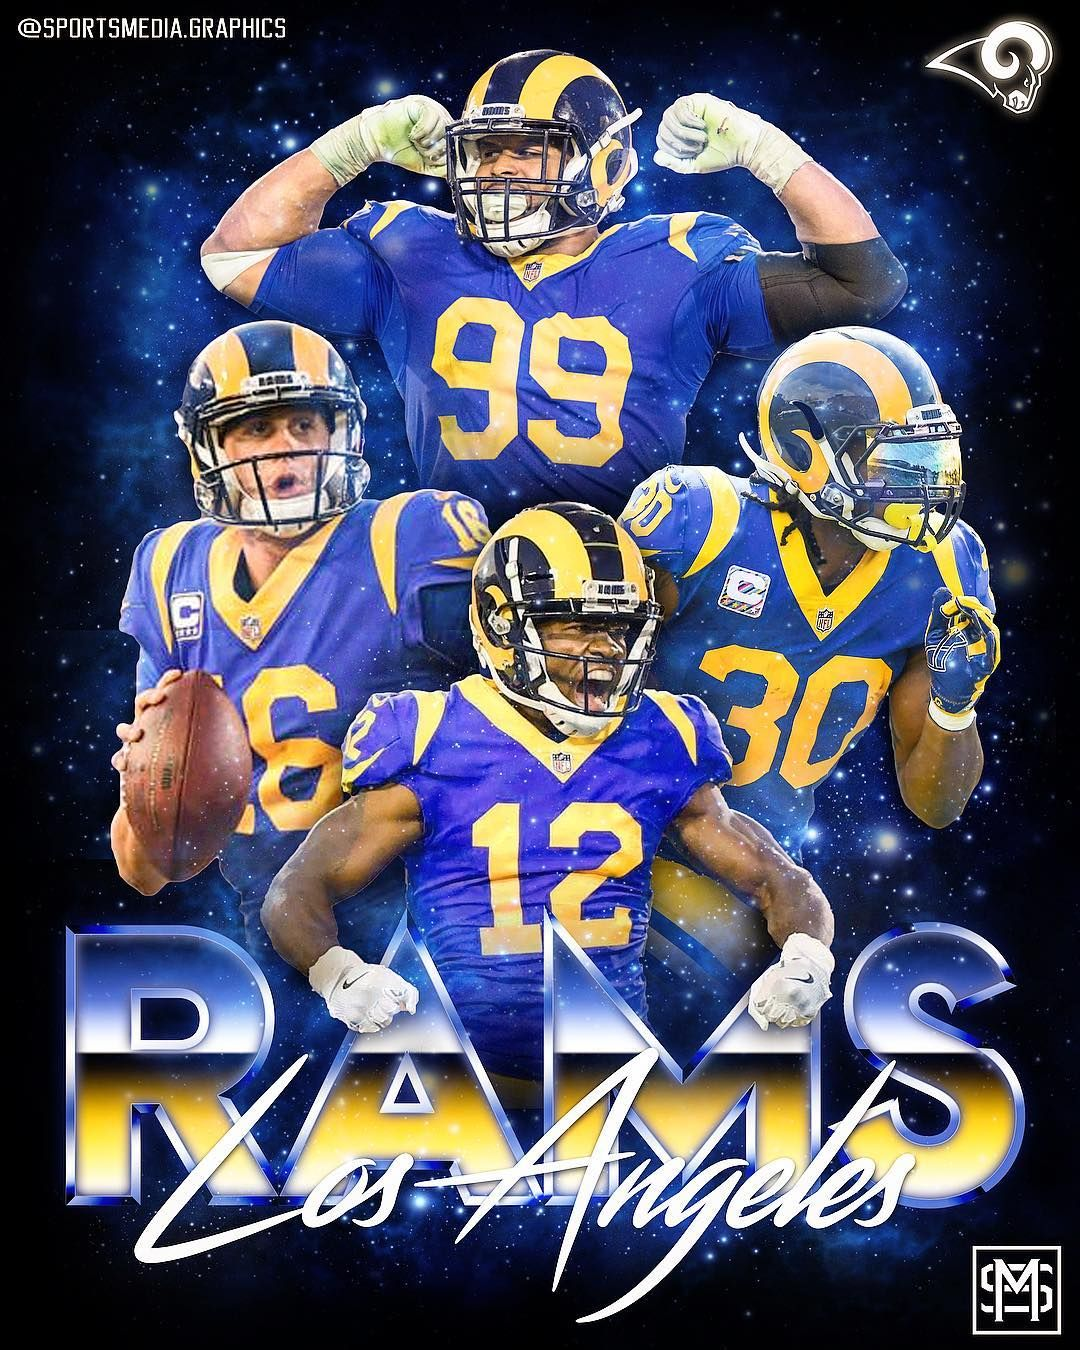 La Rams Design Who You Got Rams Or Cowboys Losangeles Rams Toddgurley Aarondonald Brandincooks Jar La Rams Los Angeles Rams Football Memes Nfl